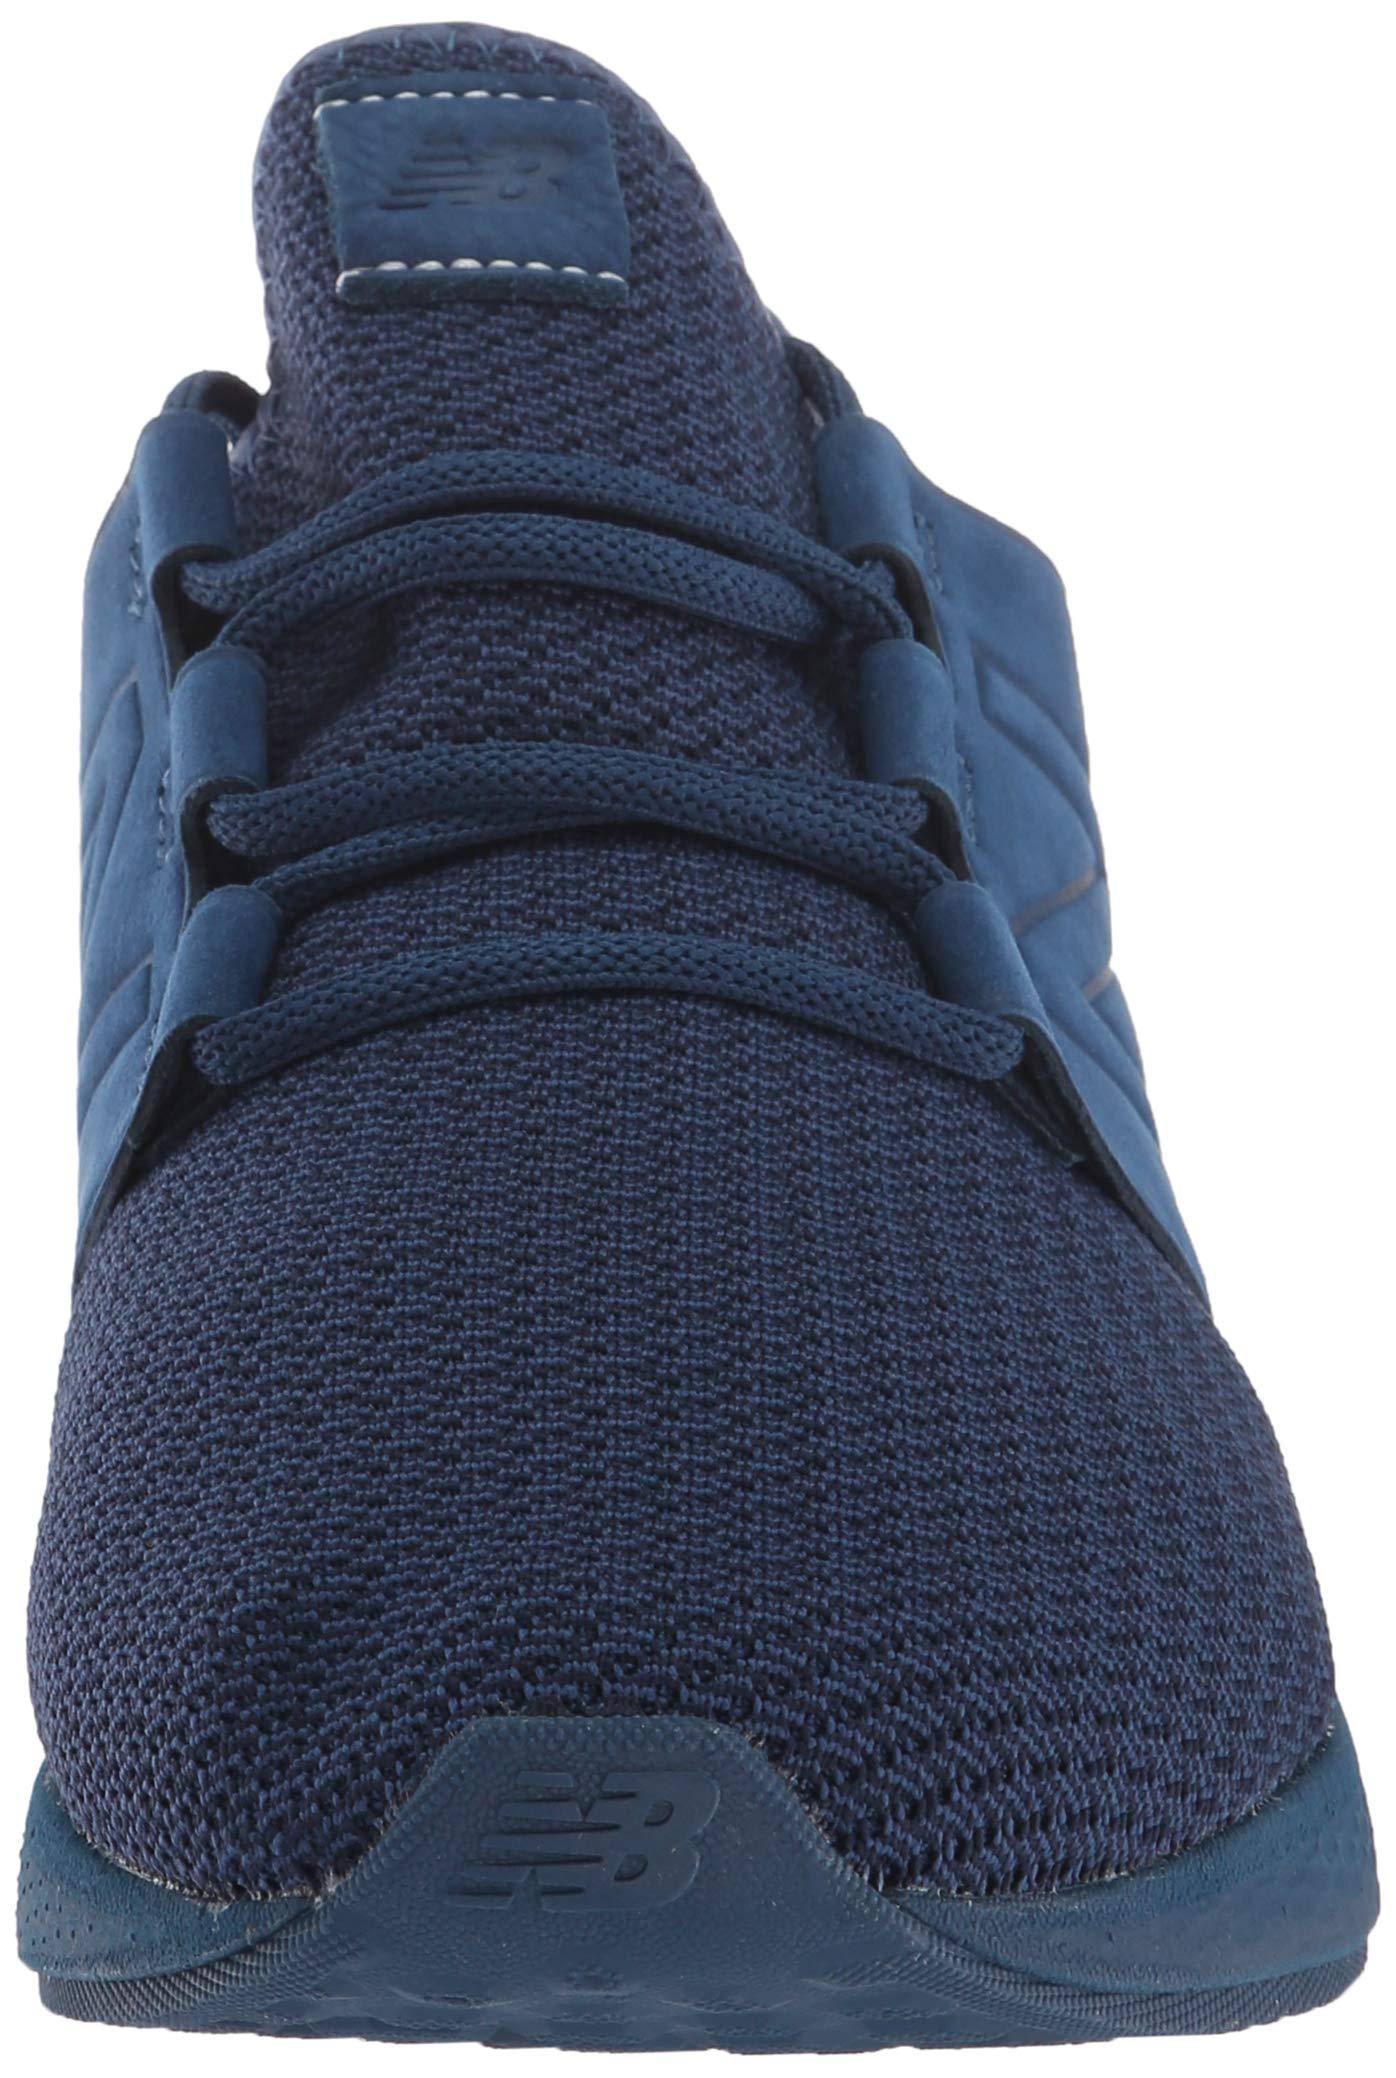 New Balance Men's Cruz V2 Fresh Foam Running Shoe, moroccan tile, 7 D US by New Balance (Image #4)